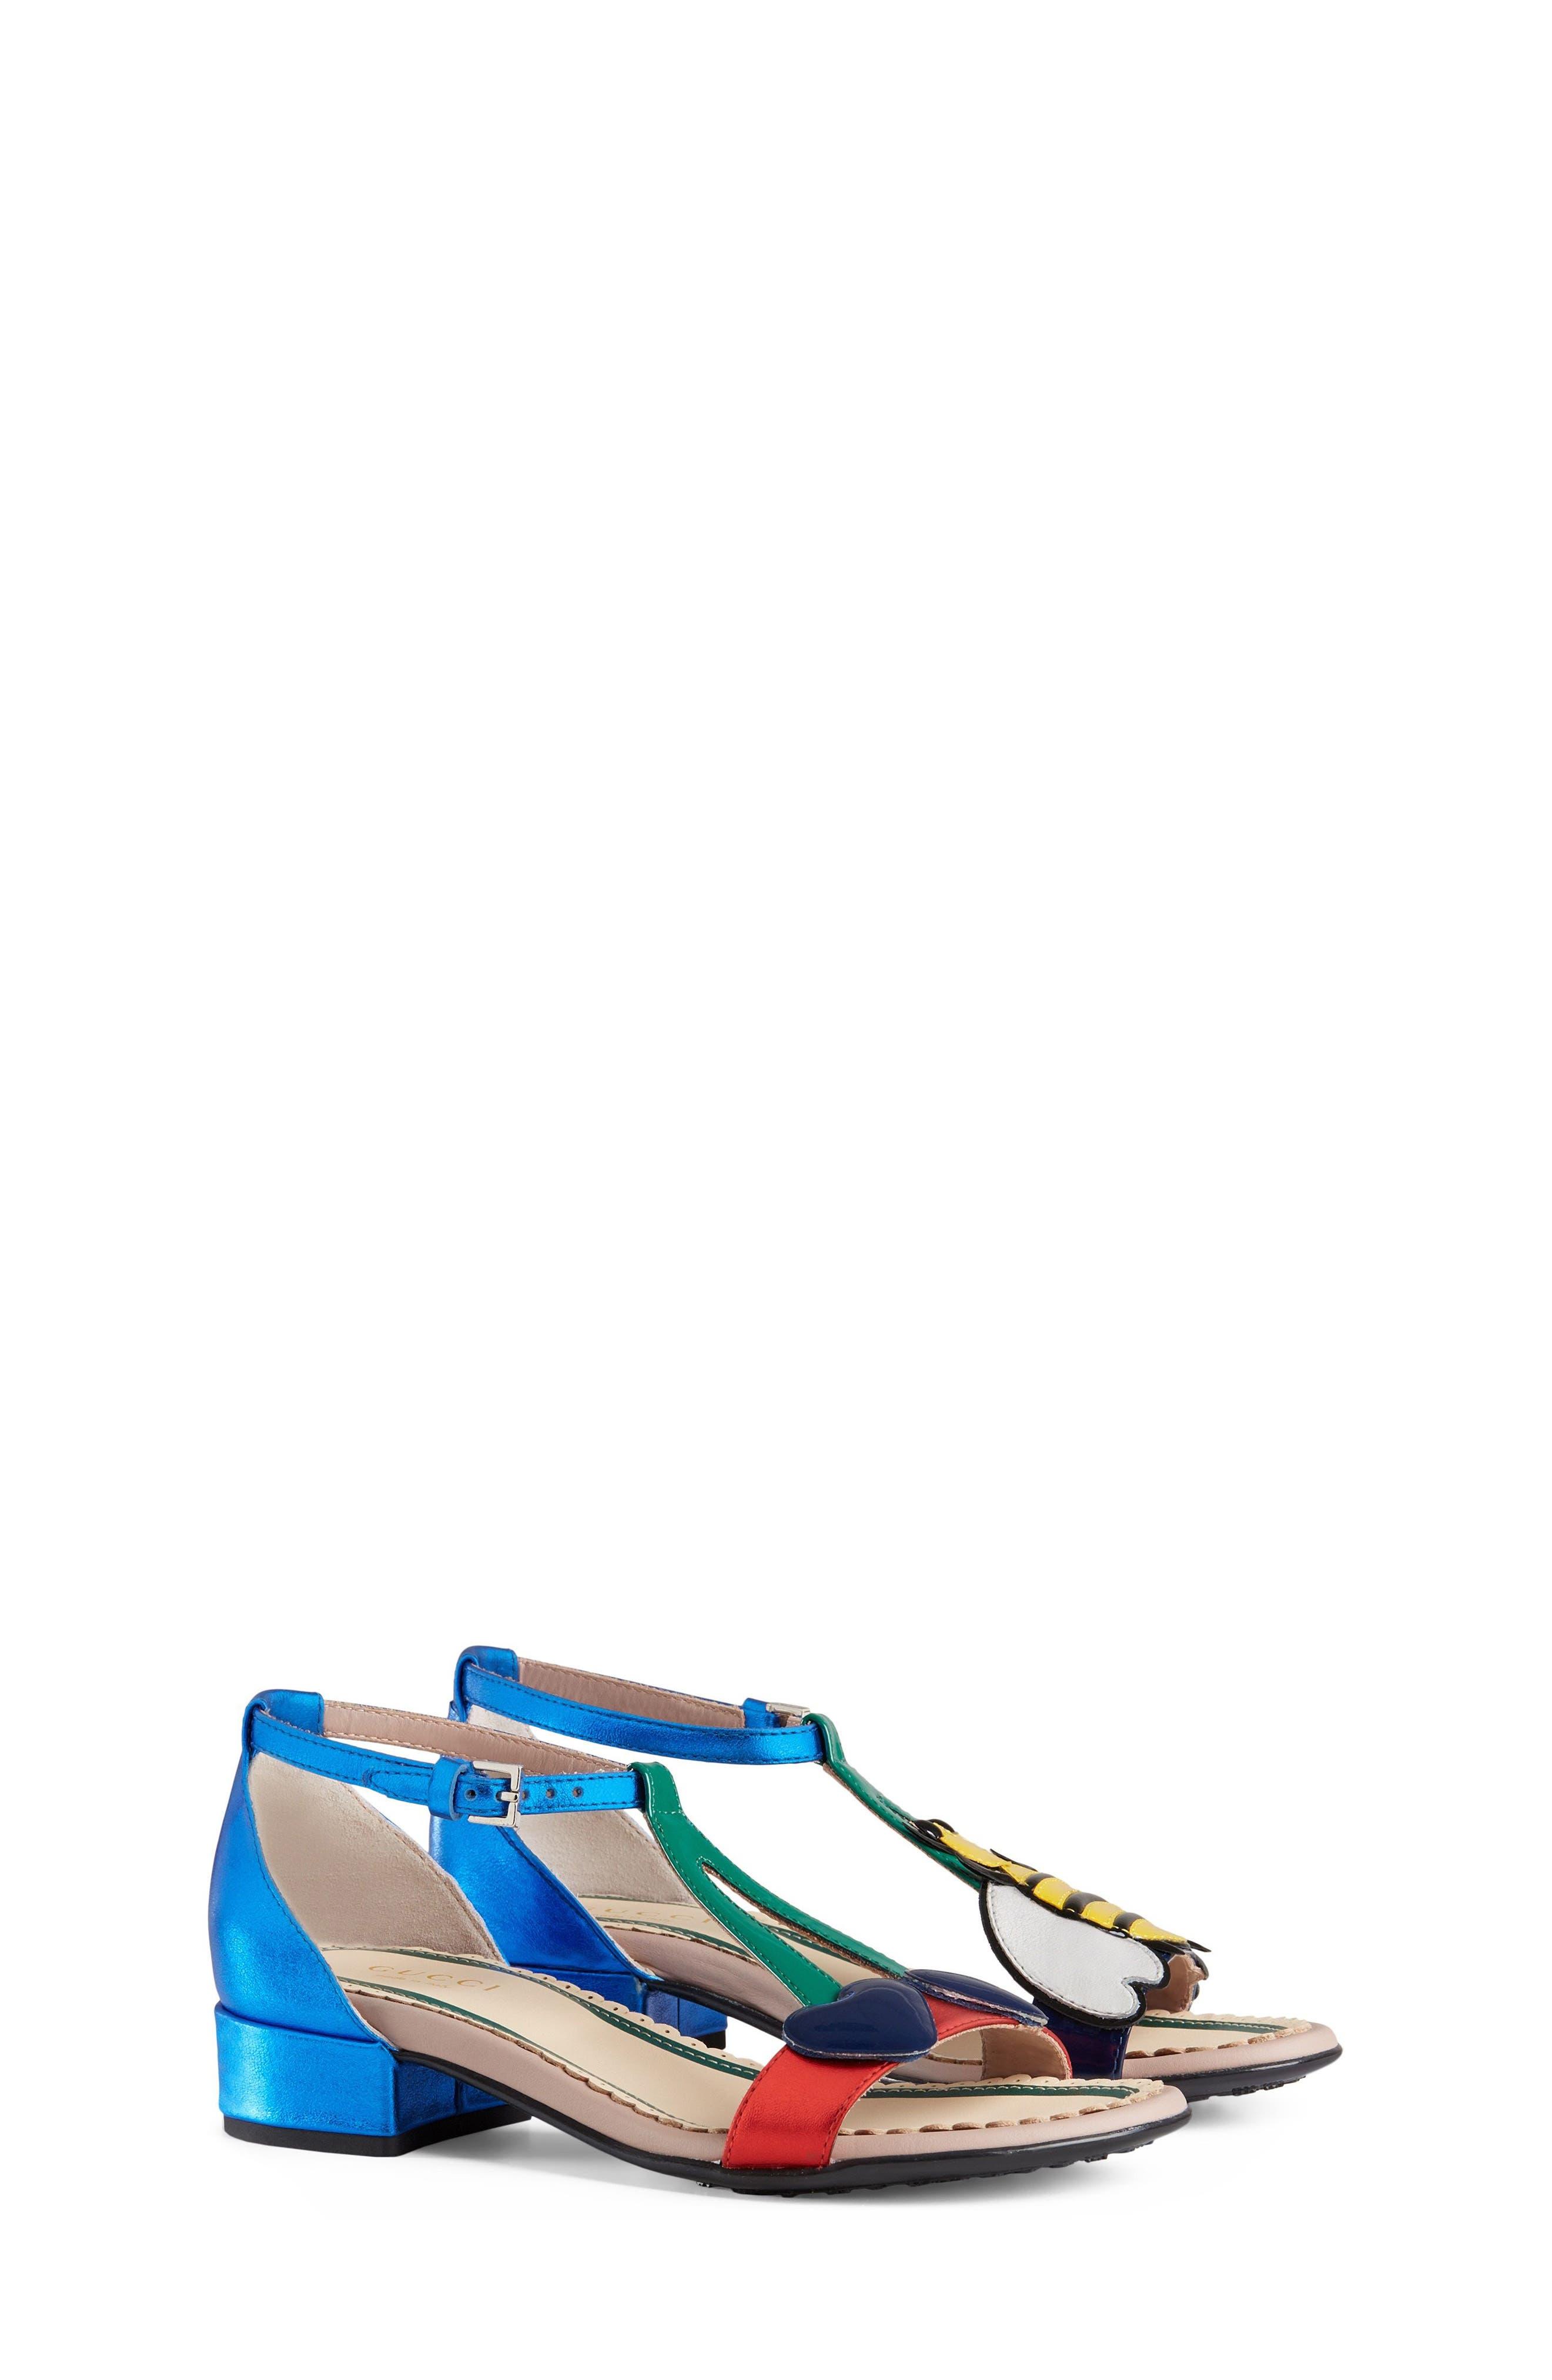 Bee Cerise Sandal,                         Main,                         color, 400